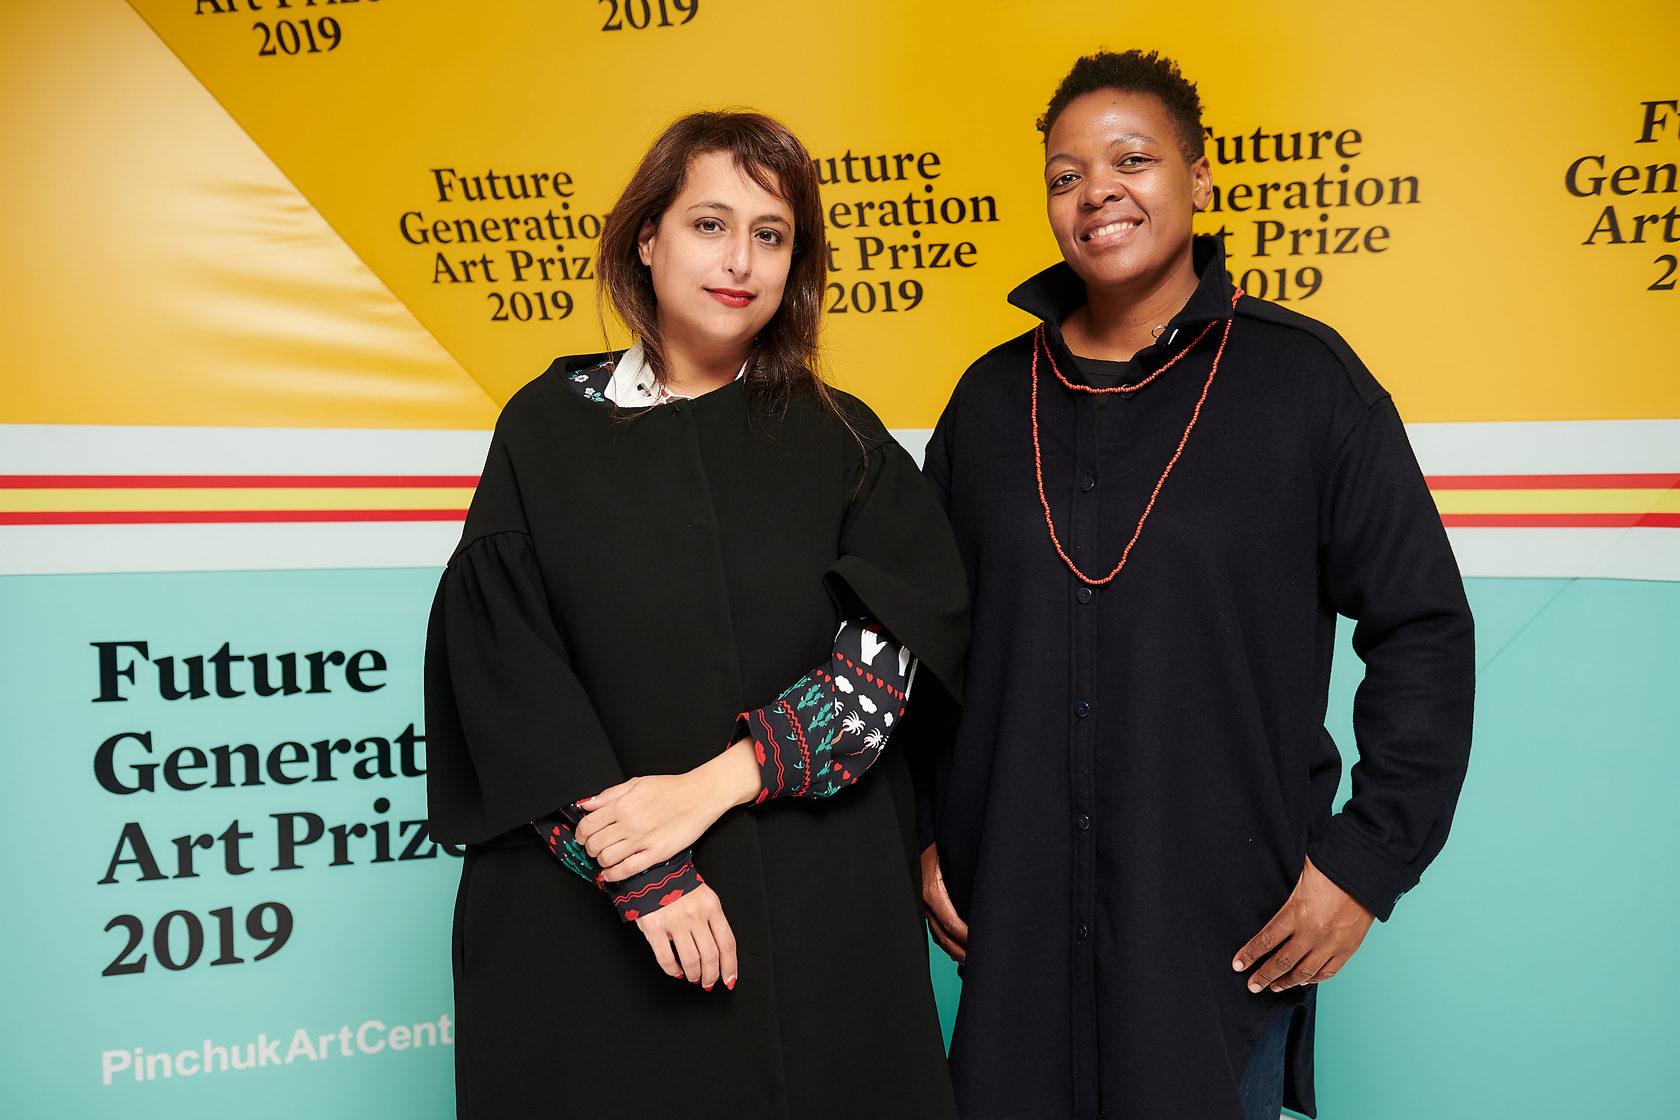 Future Generation Art Prize 2019 - Exhibitions